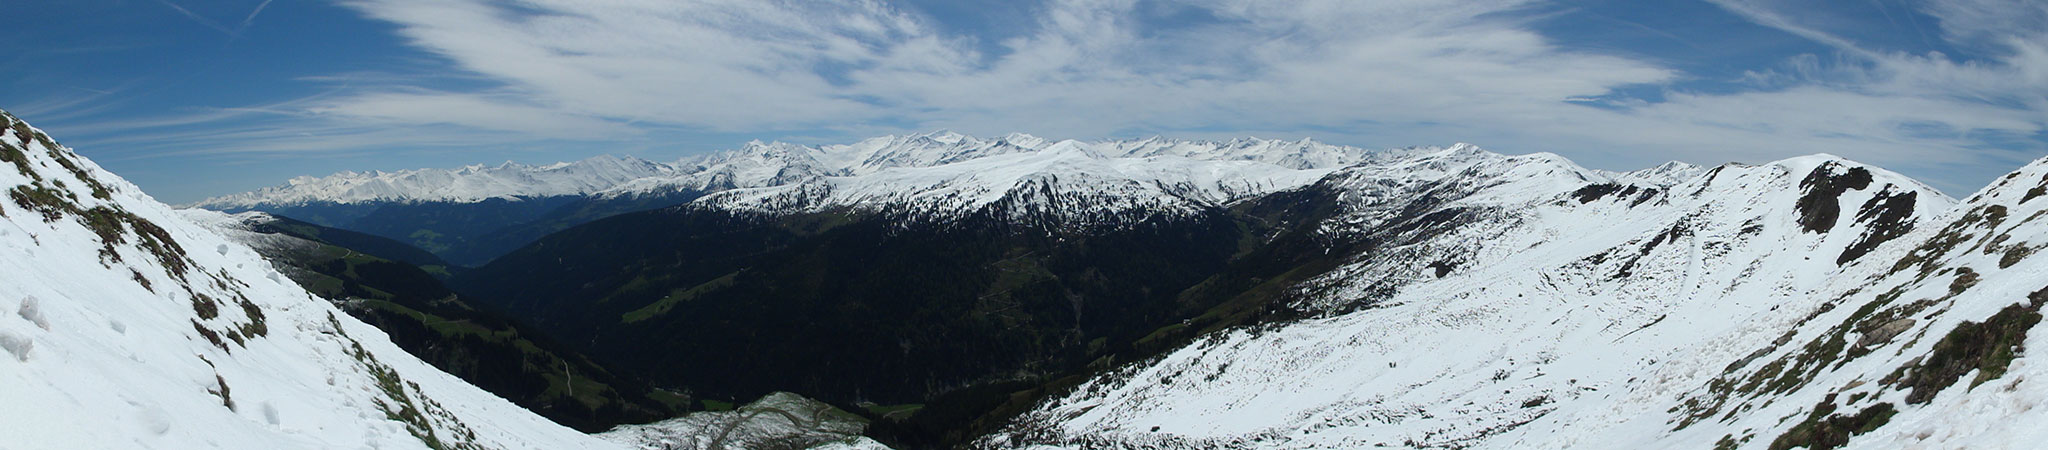 Arnoweg: Blick vom Steinfeldjoch Richtung Süden